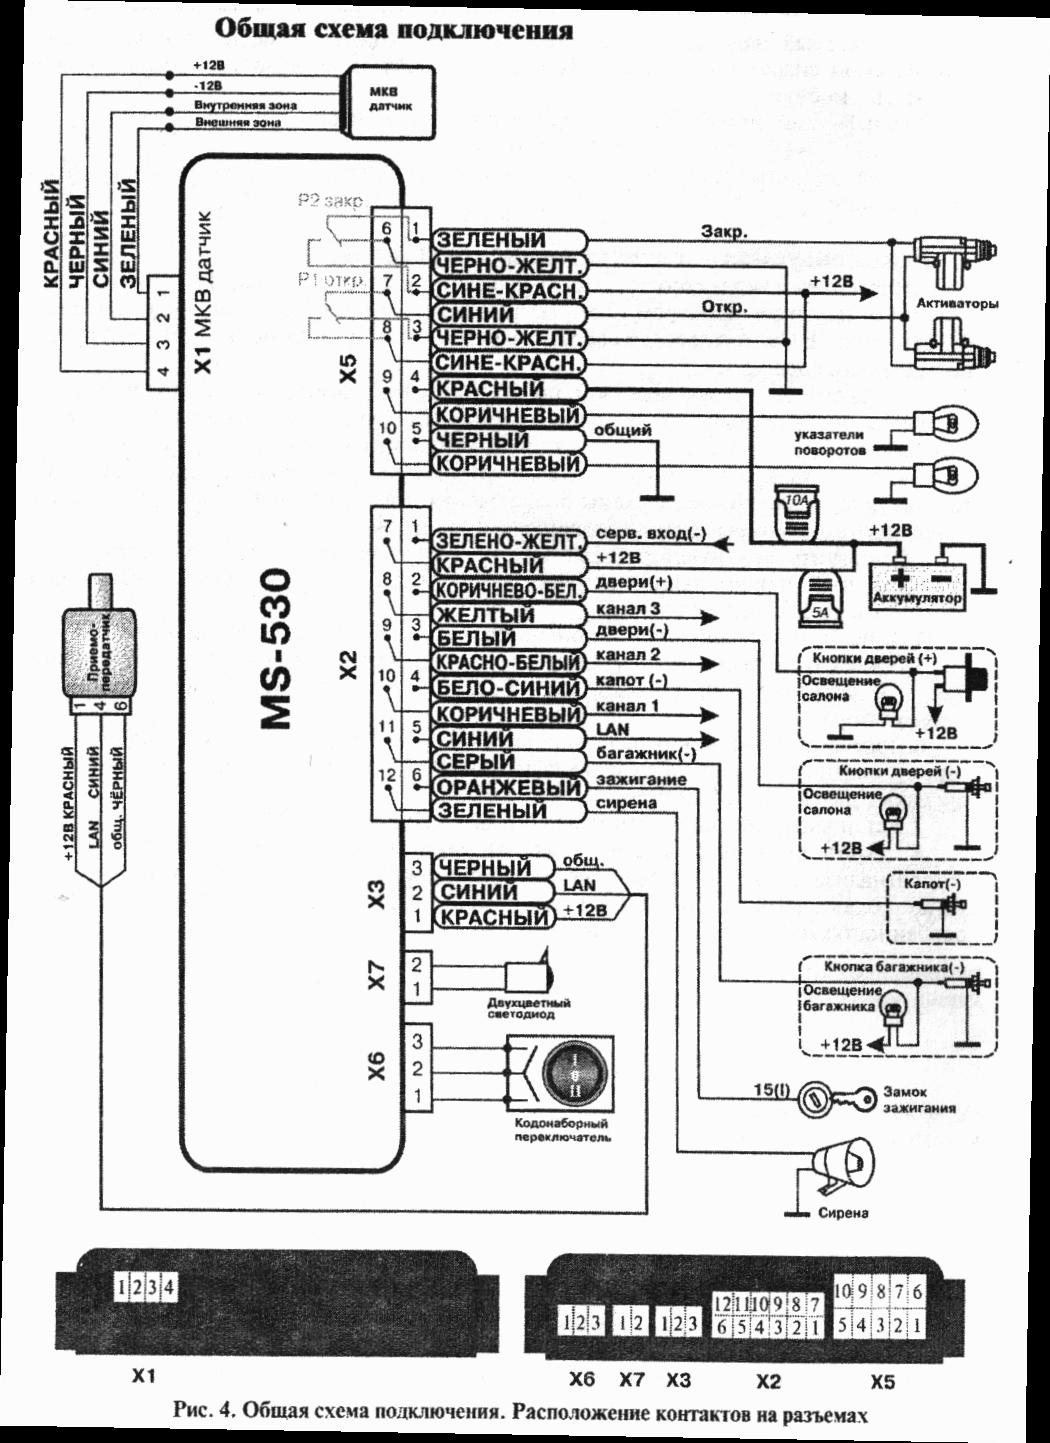 Инструкция magic systems схема нажатия кнопок на белке